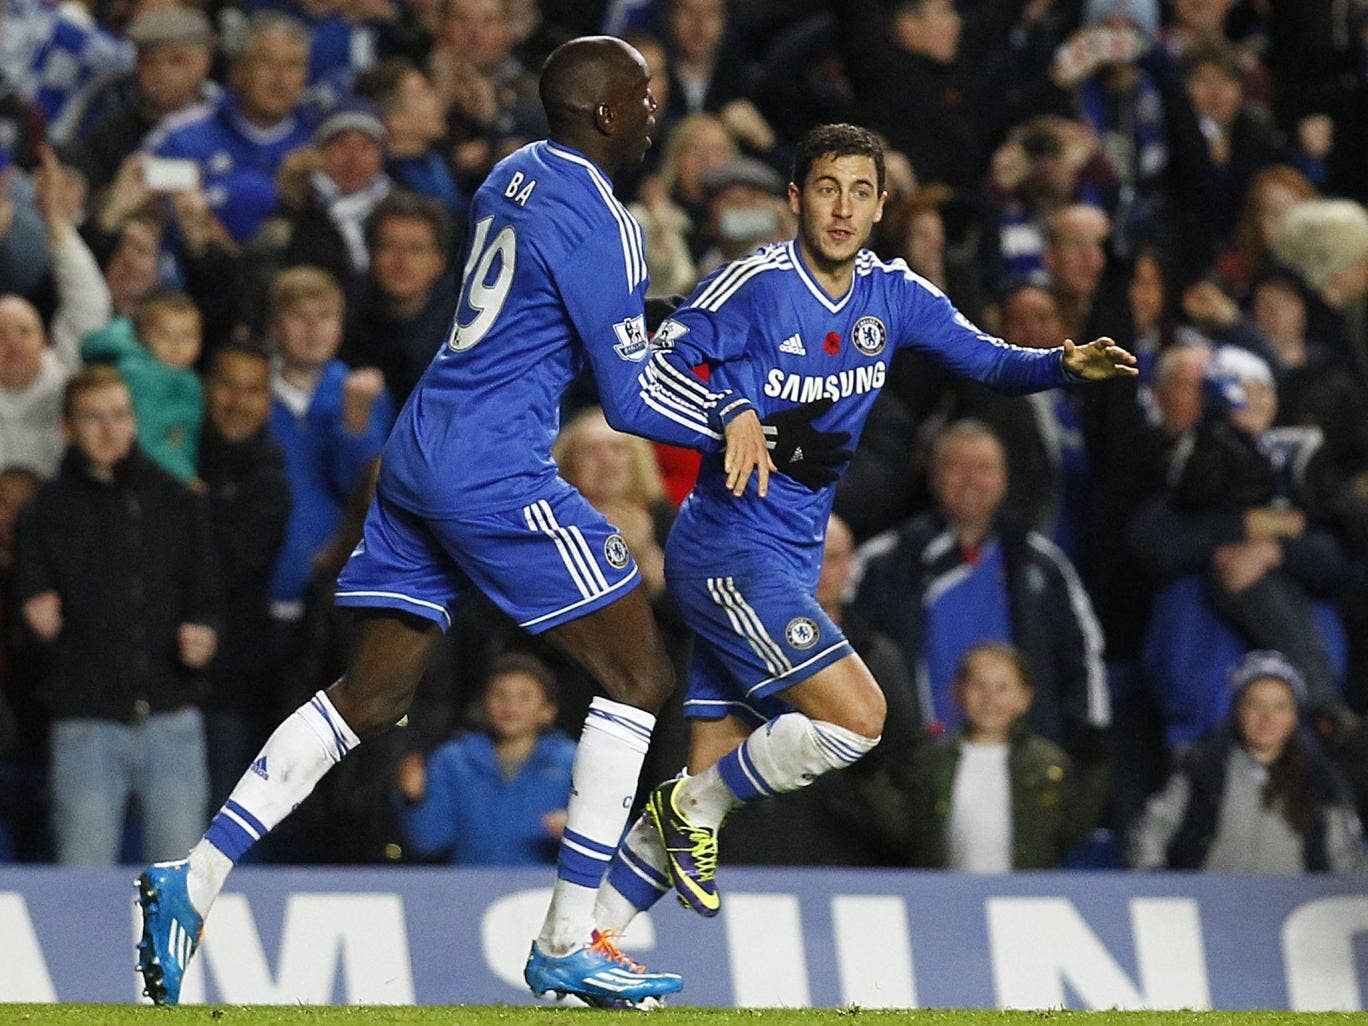 Eden Hazard of Chelsea celebrates with team mate Demba Ba after scoring the equaliser